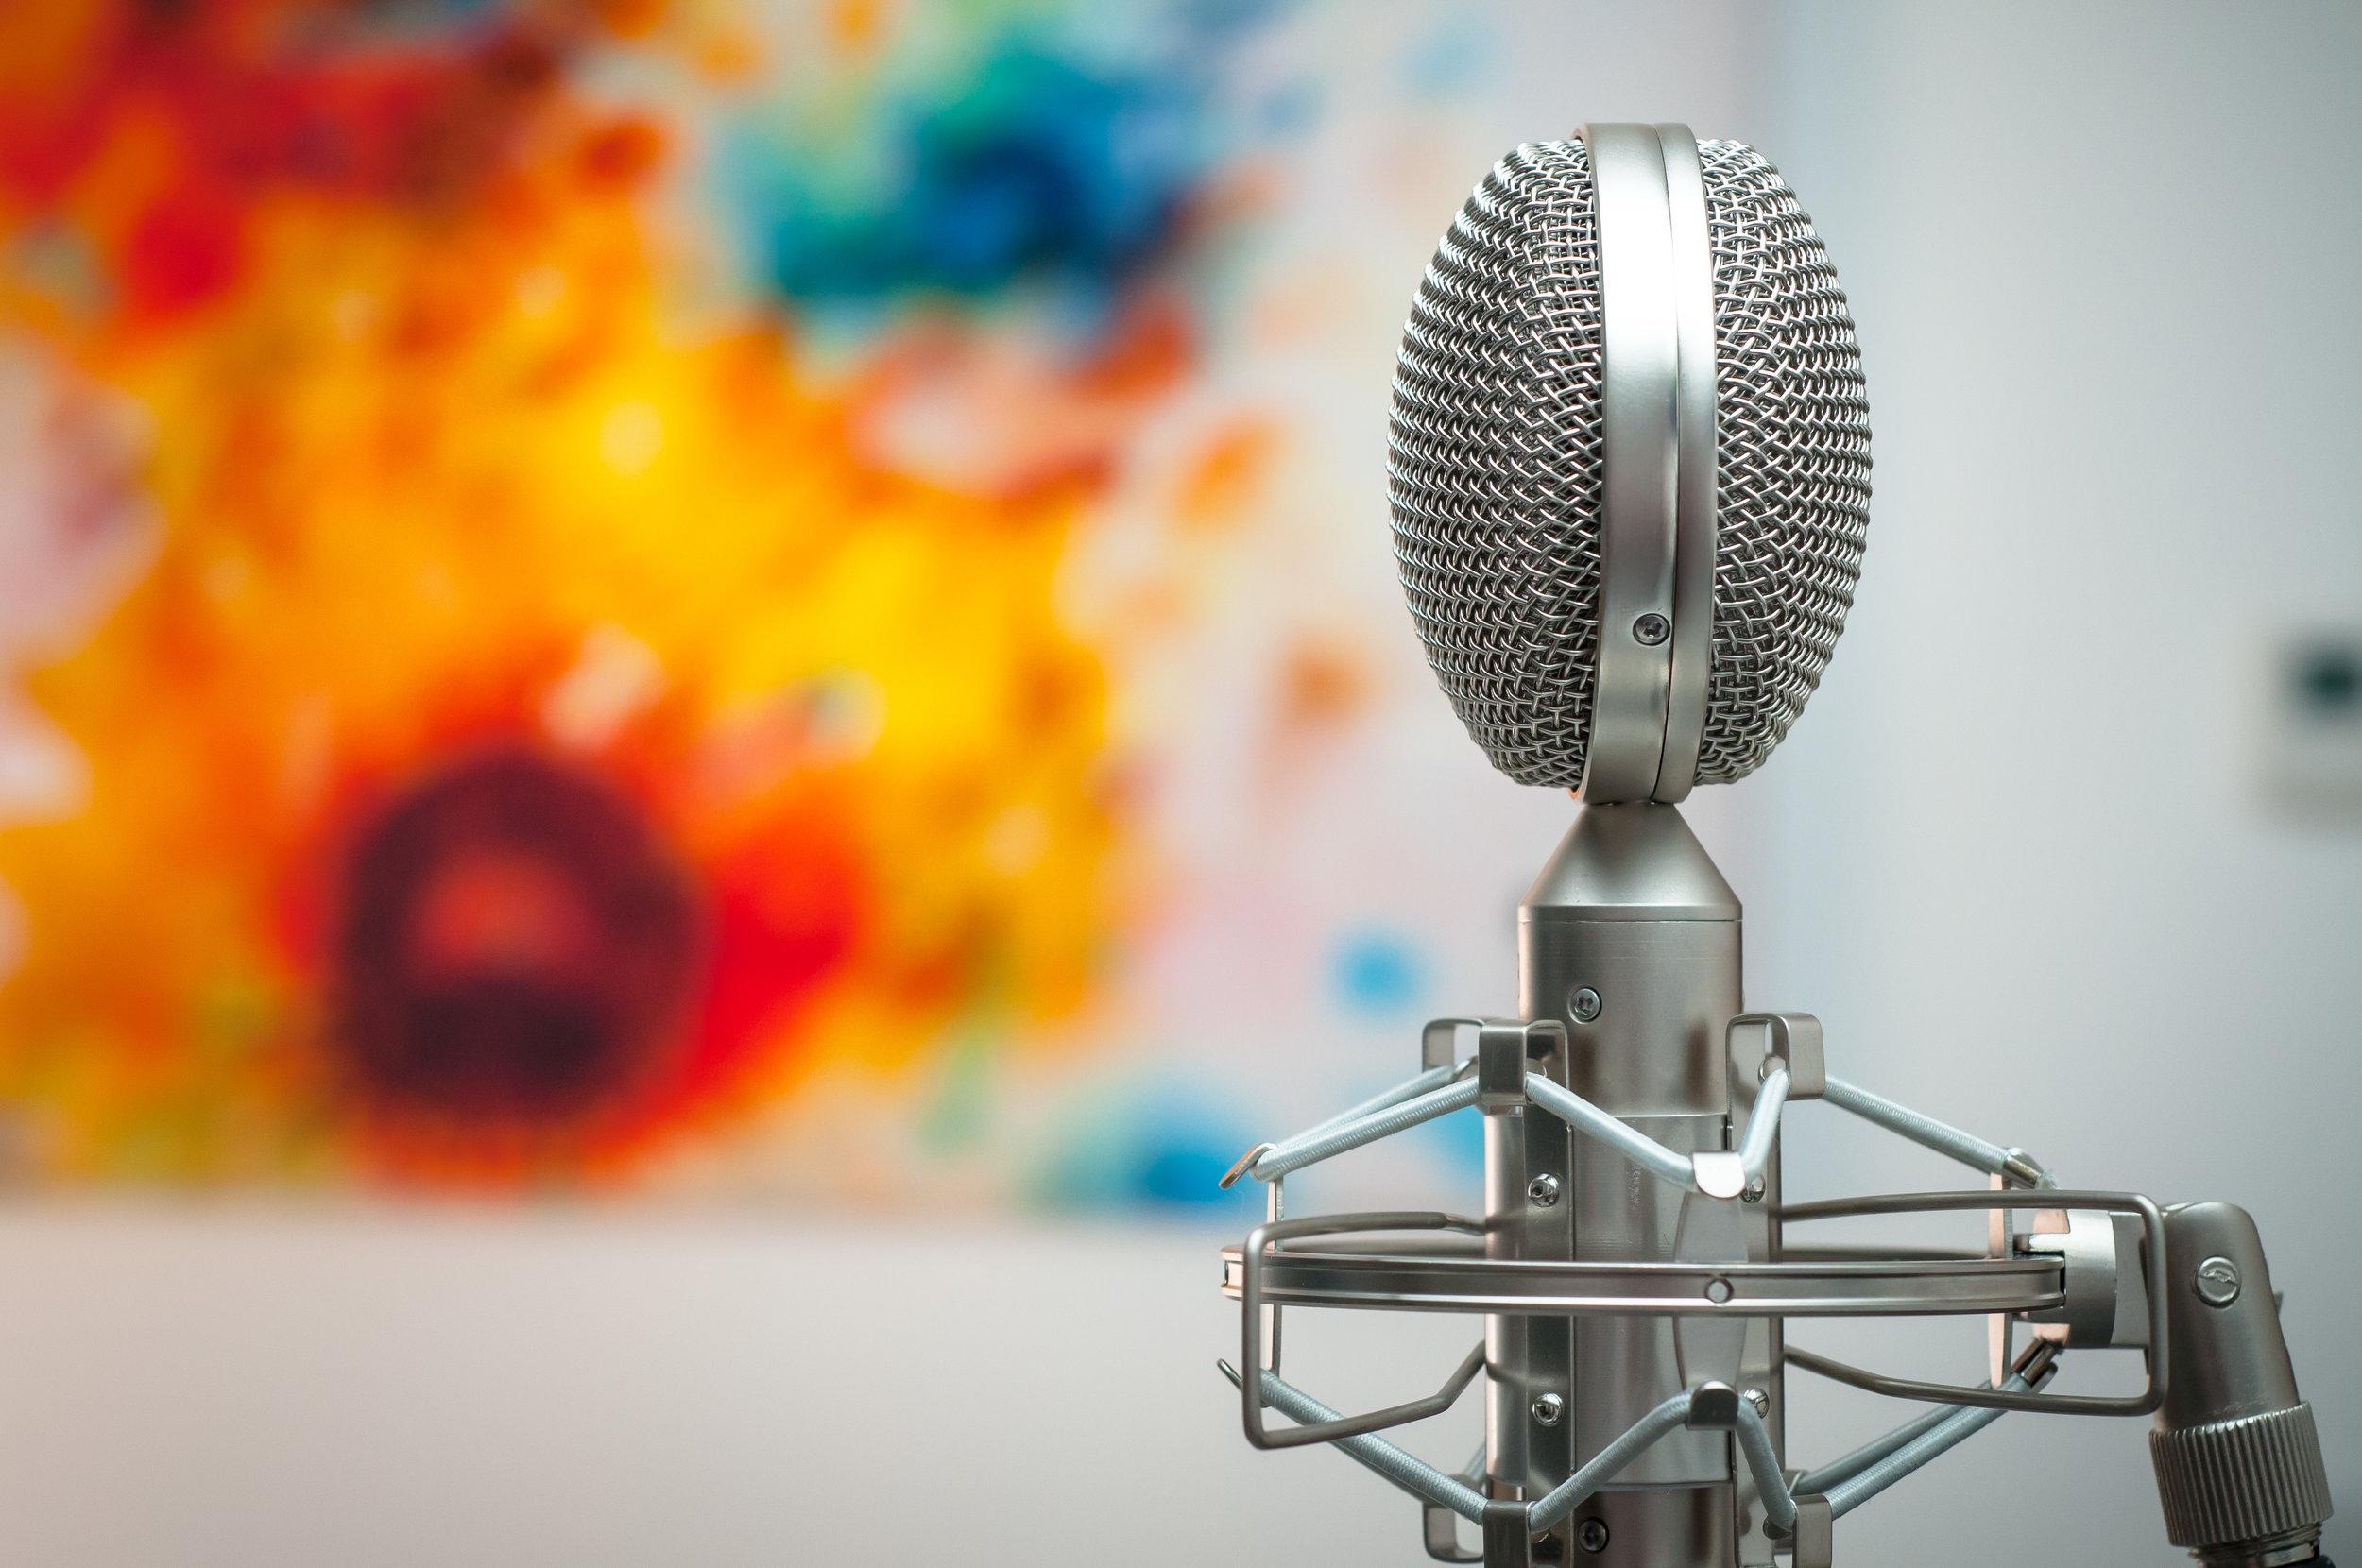 Interviews - TEXT - Q&A INTERVIEWAUDIO - PODCASTVIDEO